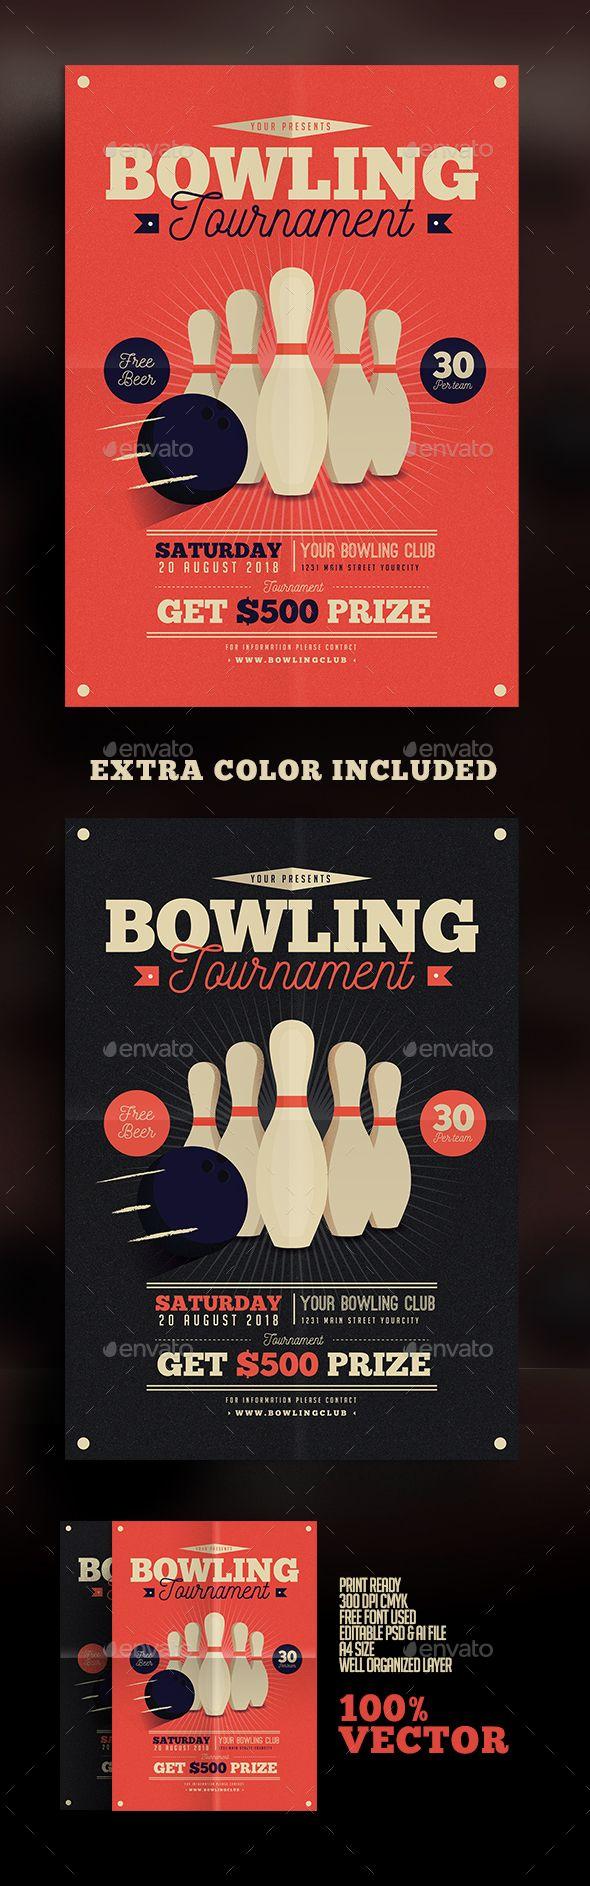 Vintage Bowling Tournament Flyer – Bowling Flyer Template